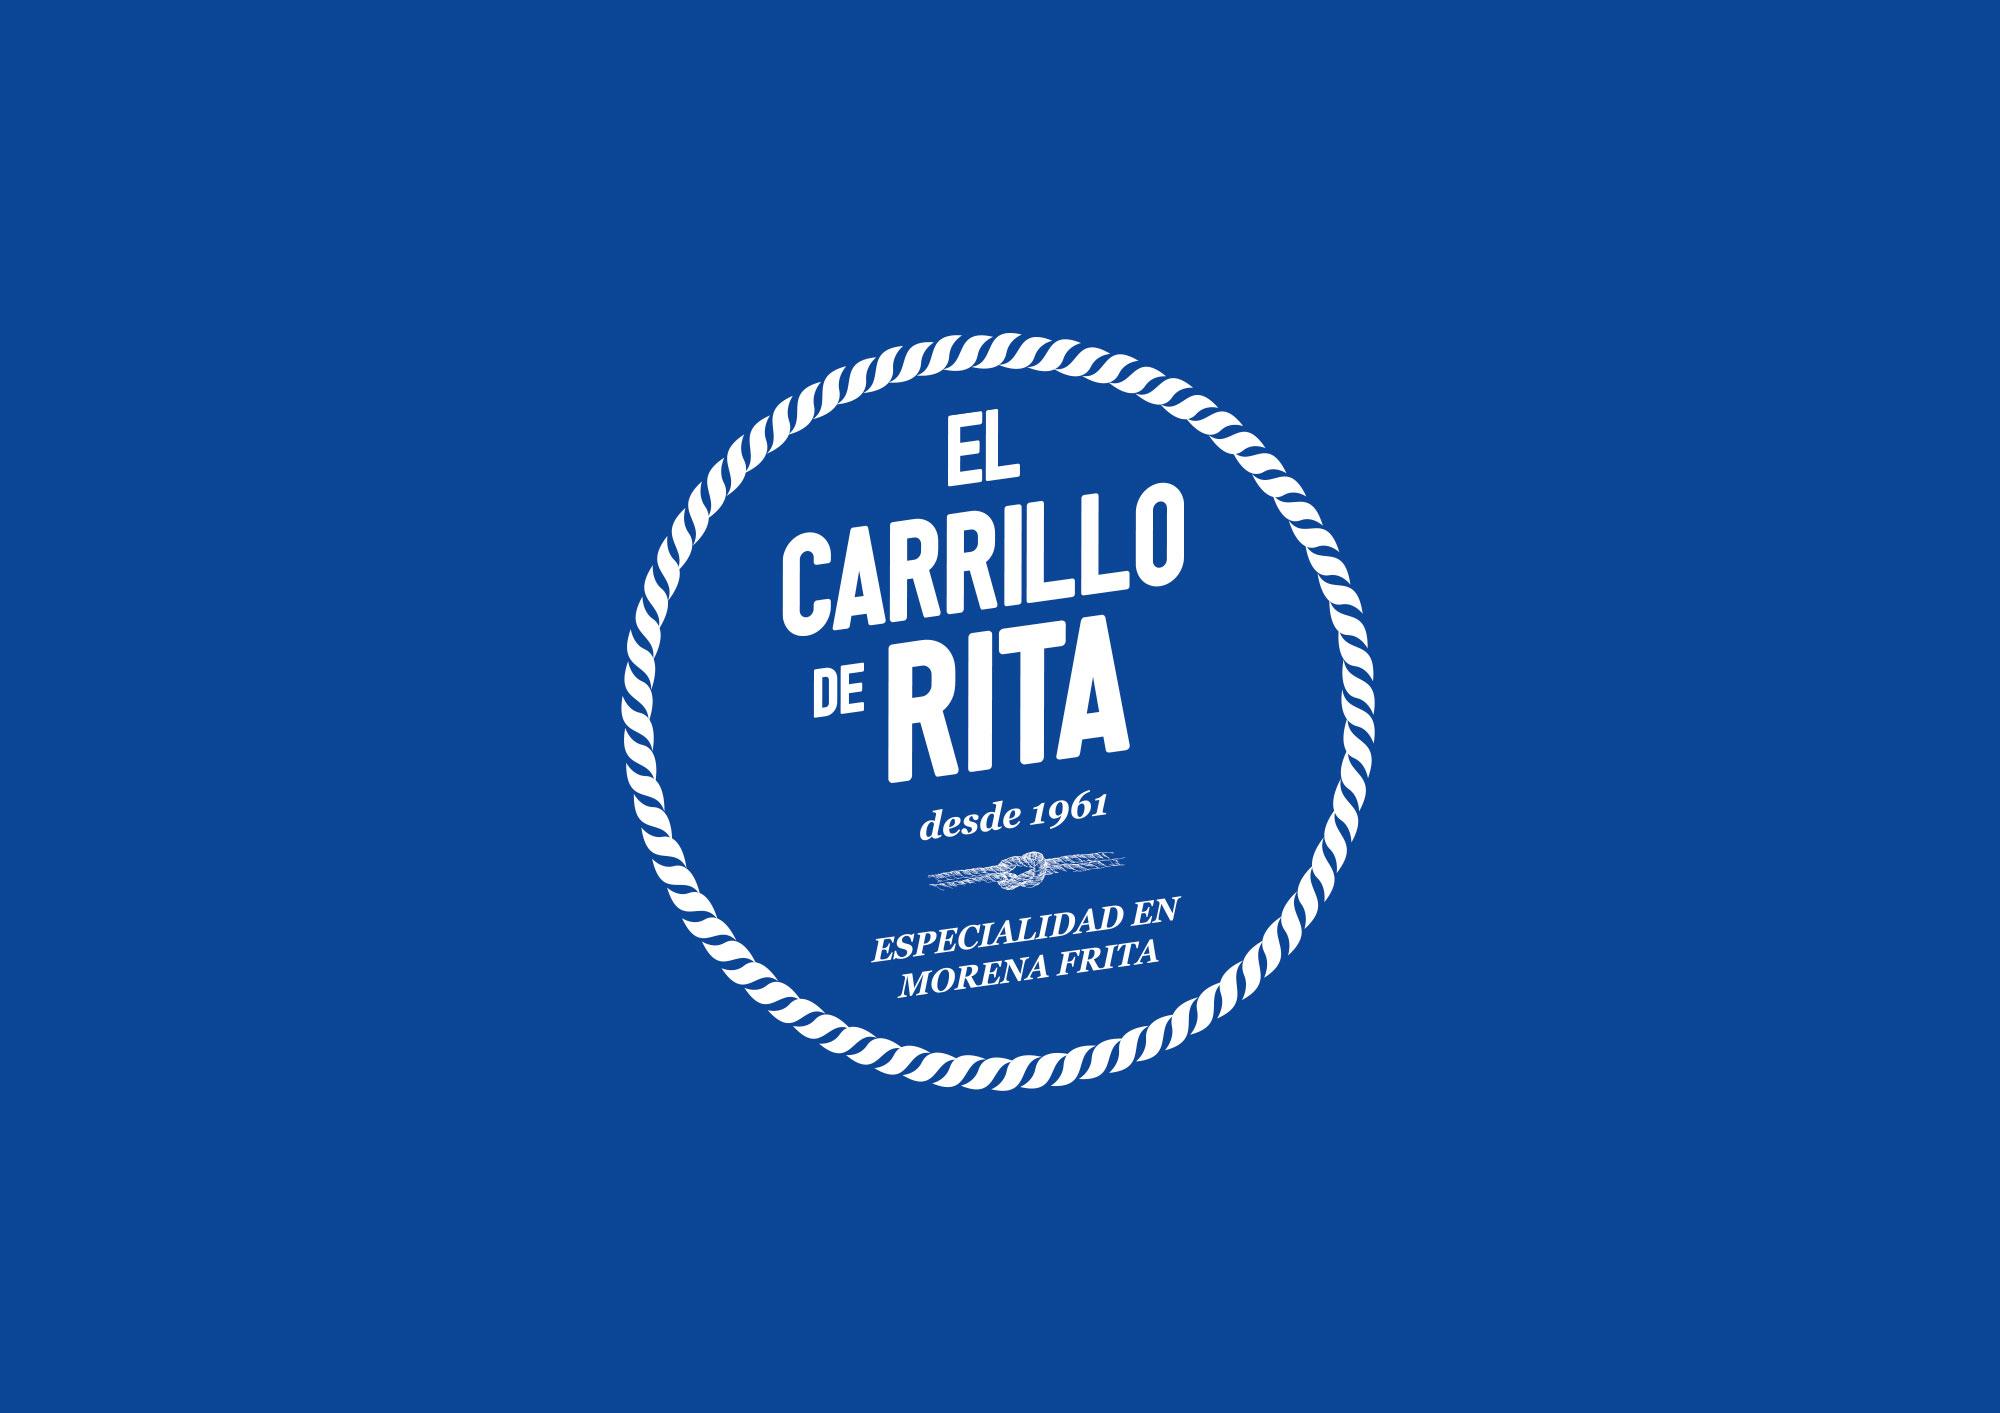 THEOFFICE_carrilloderita05.jpg